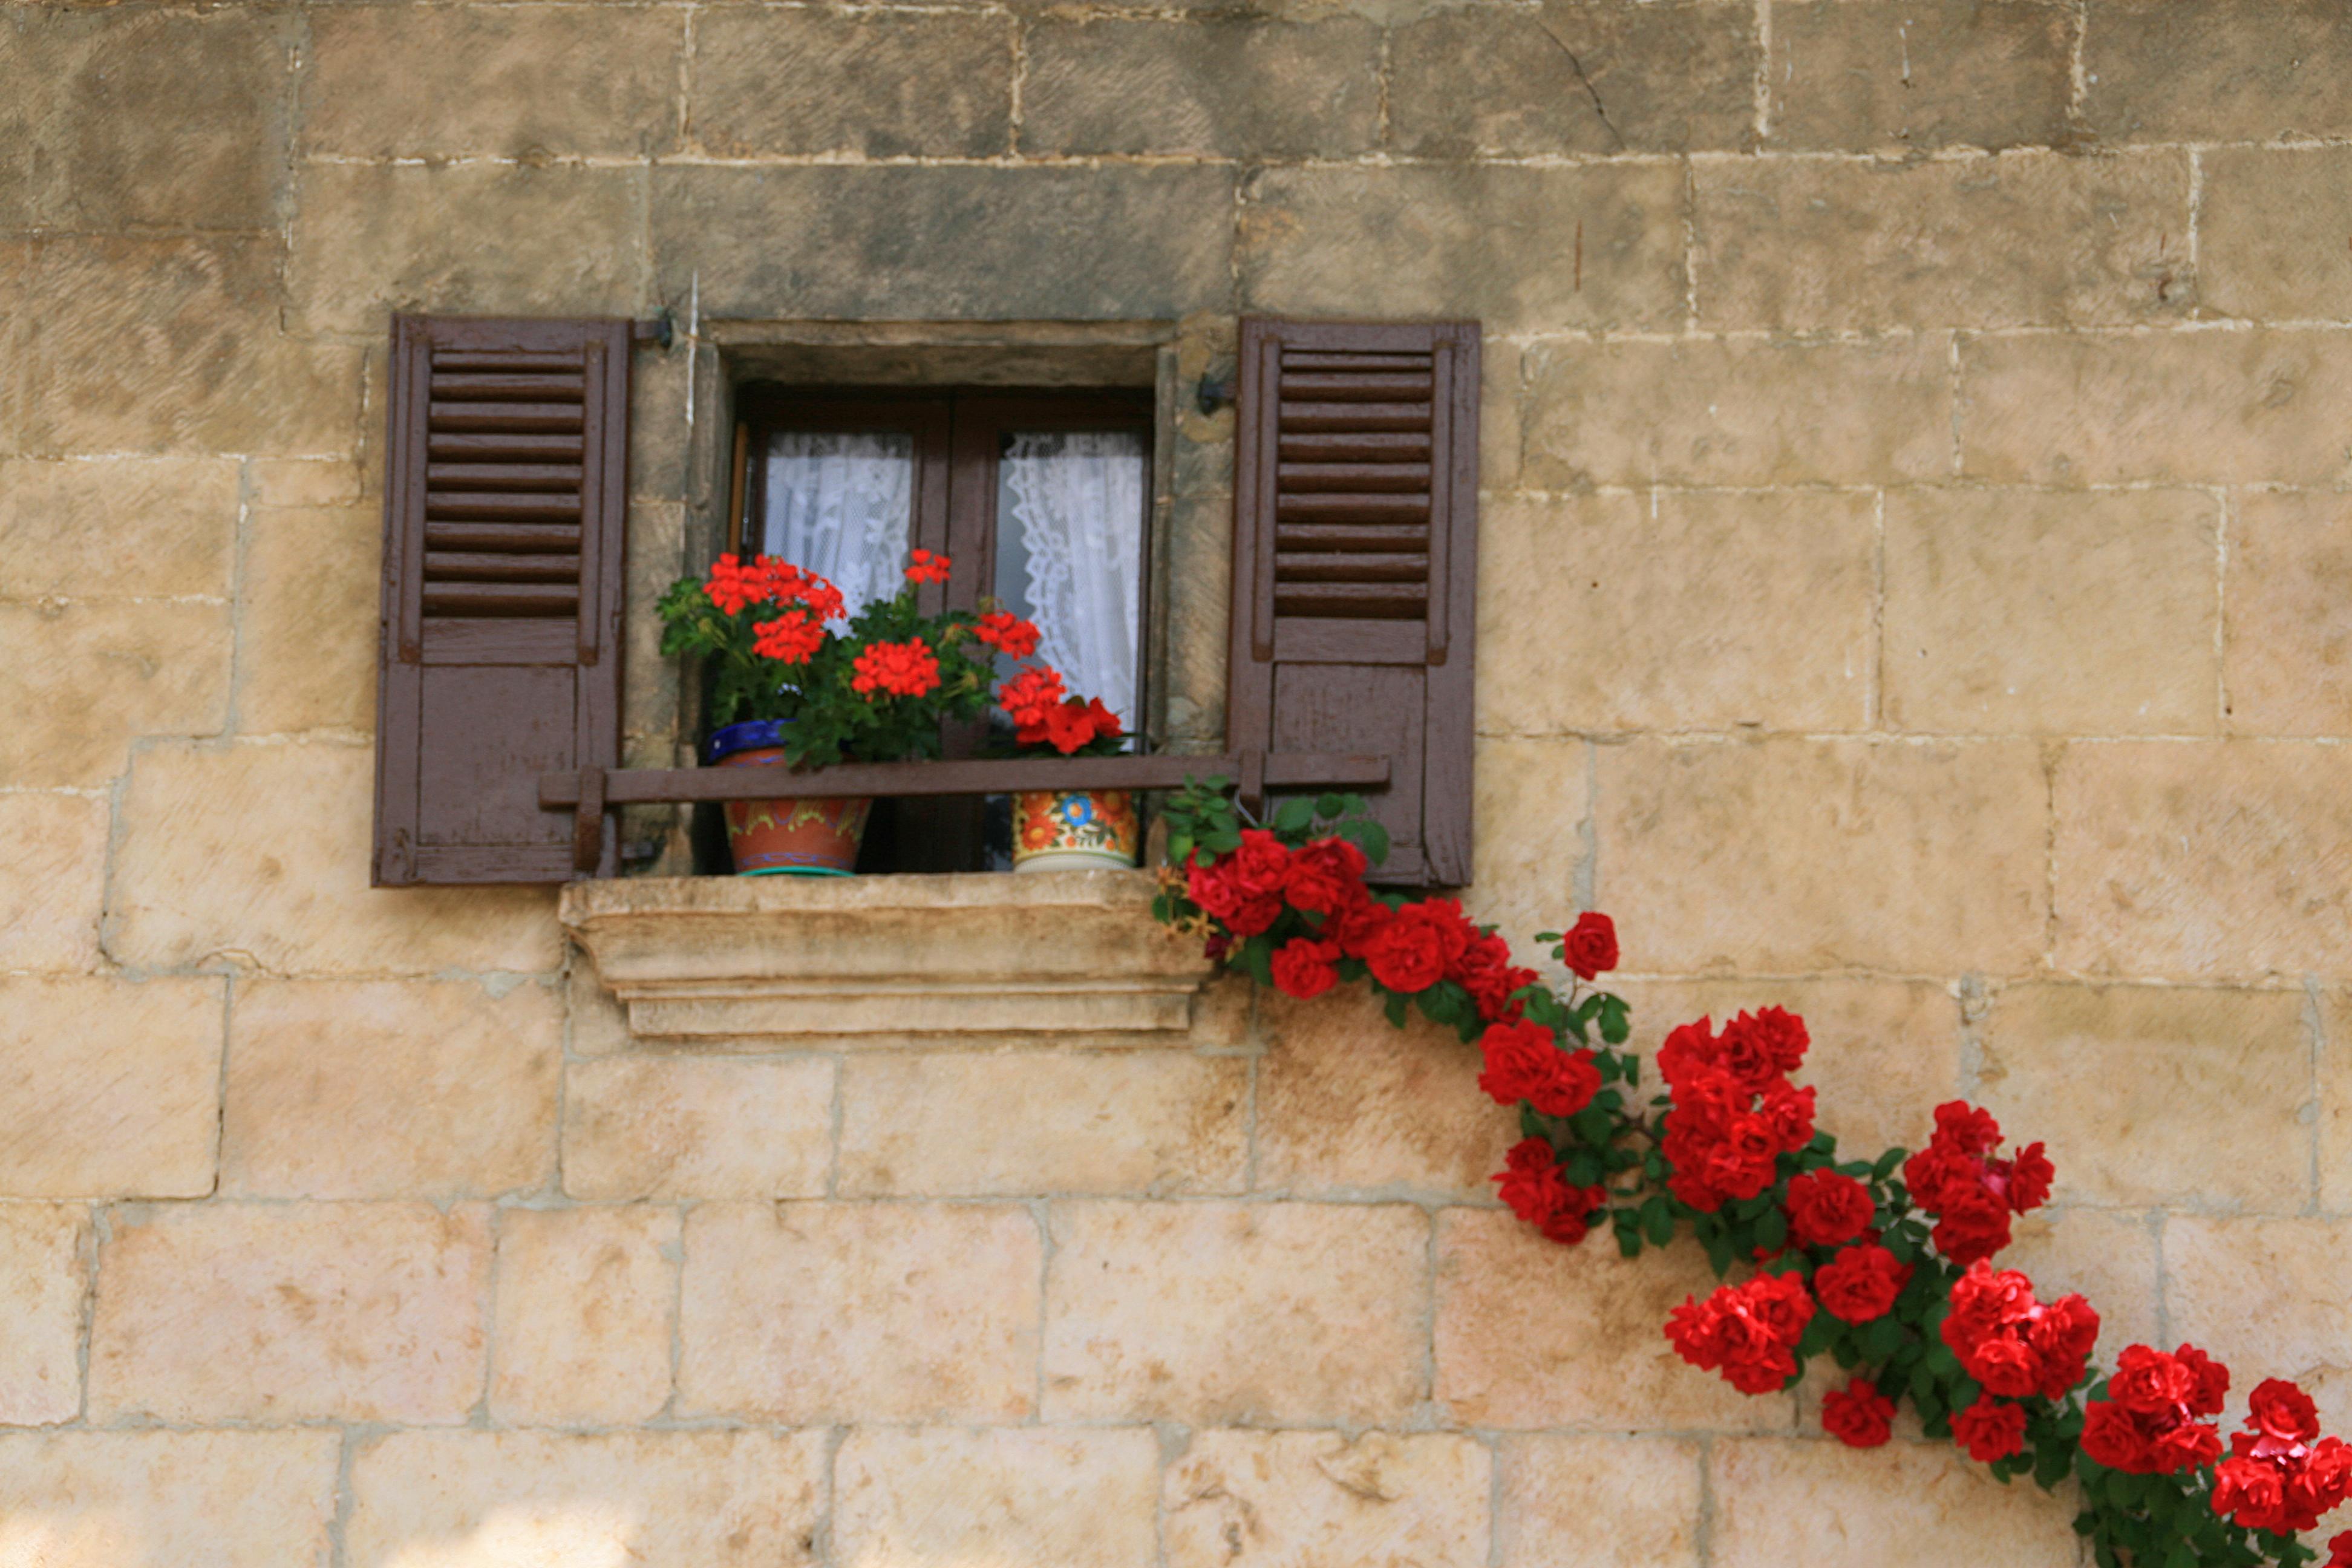 Картинки : дом, цветок, окно, стена, балкон, красный, фасад,.